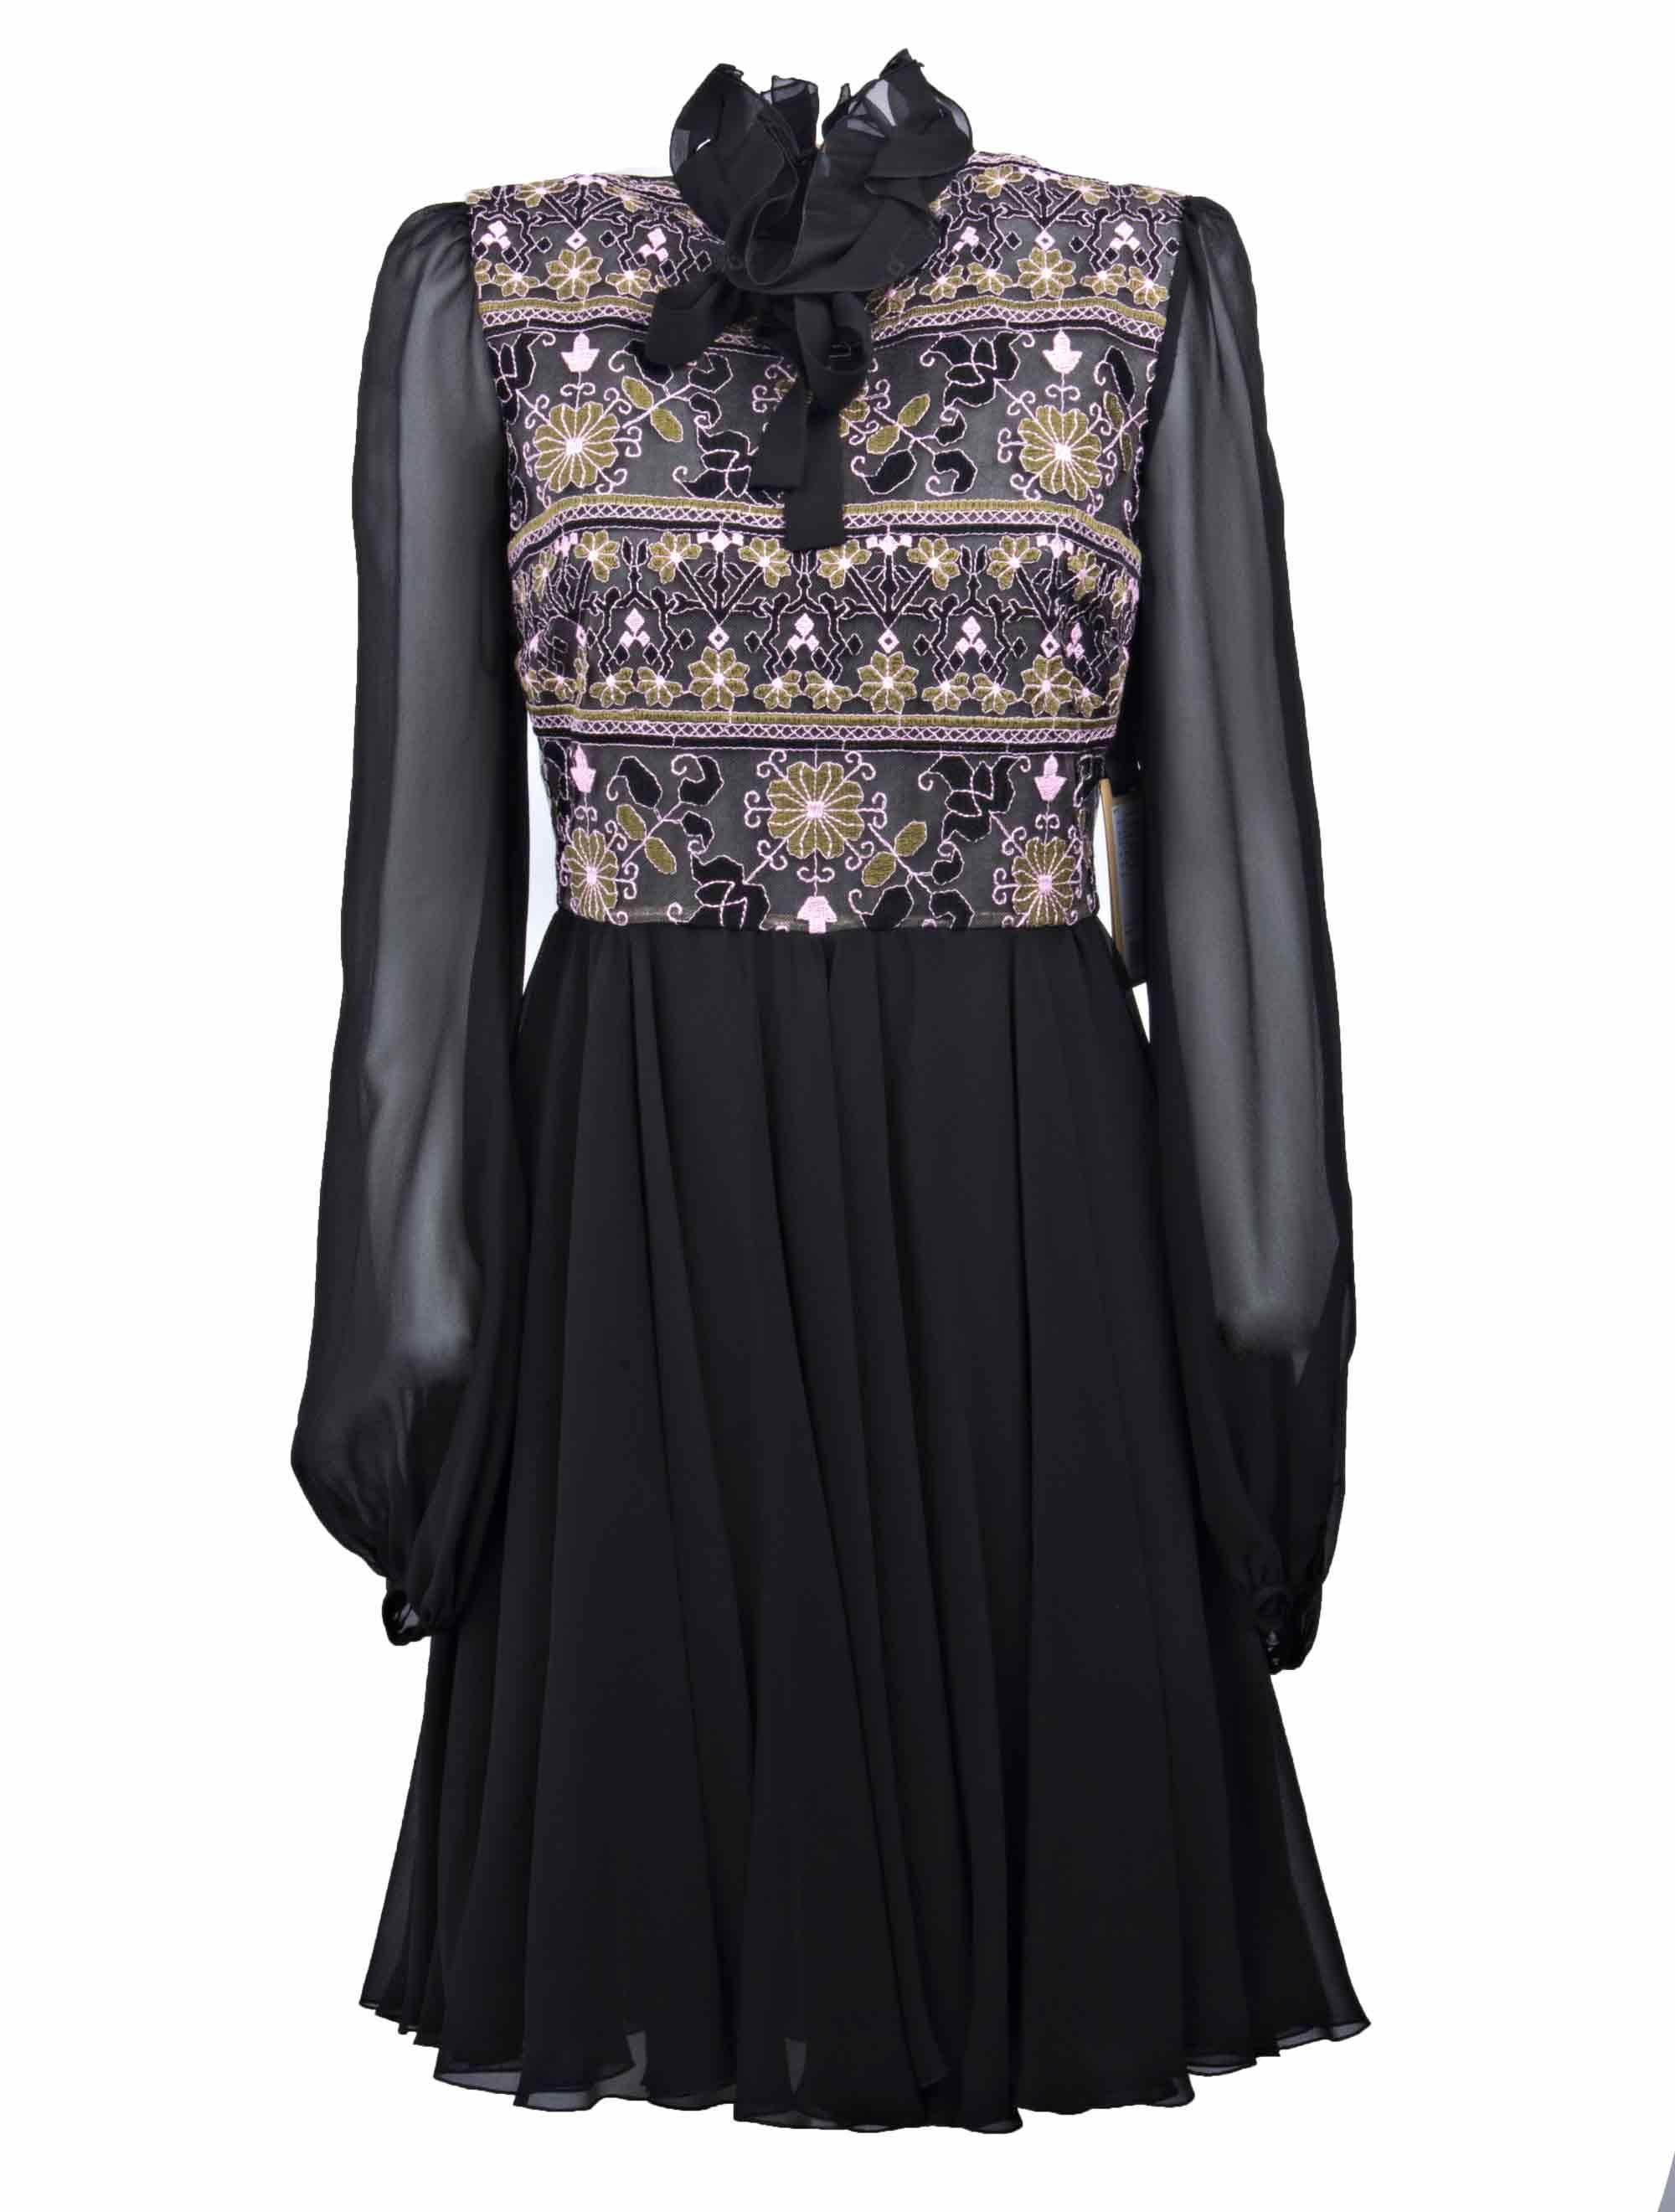 Giambattista Valli Sheer Printed Dress 9659696